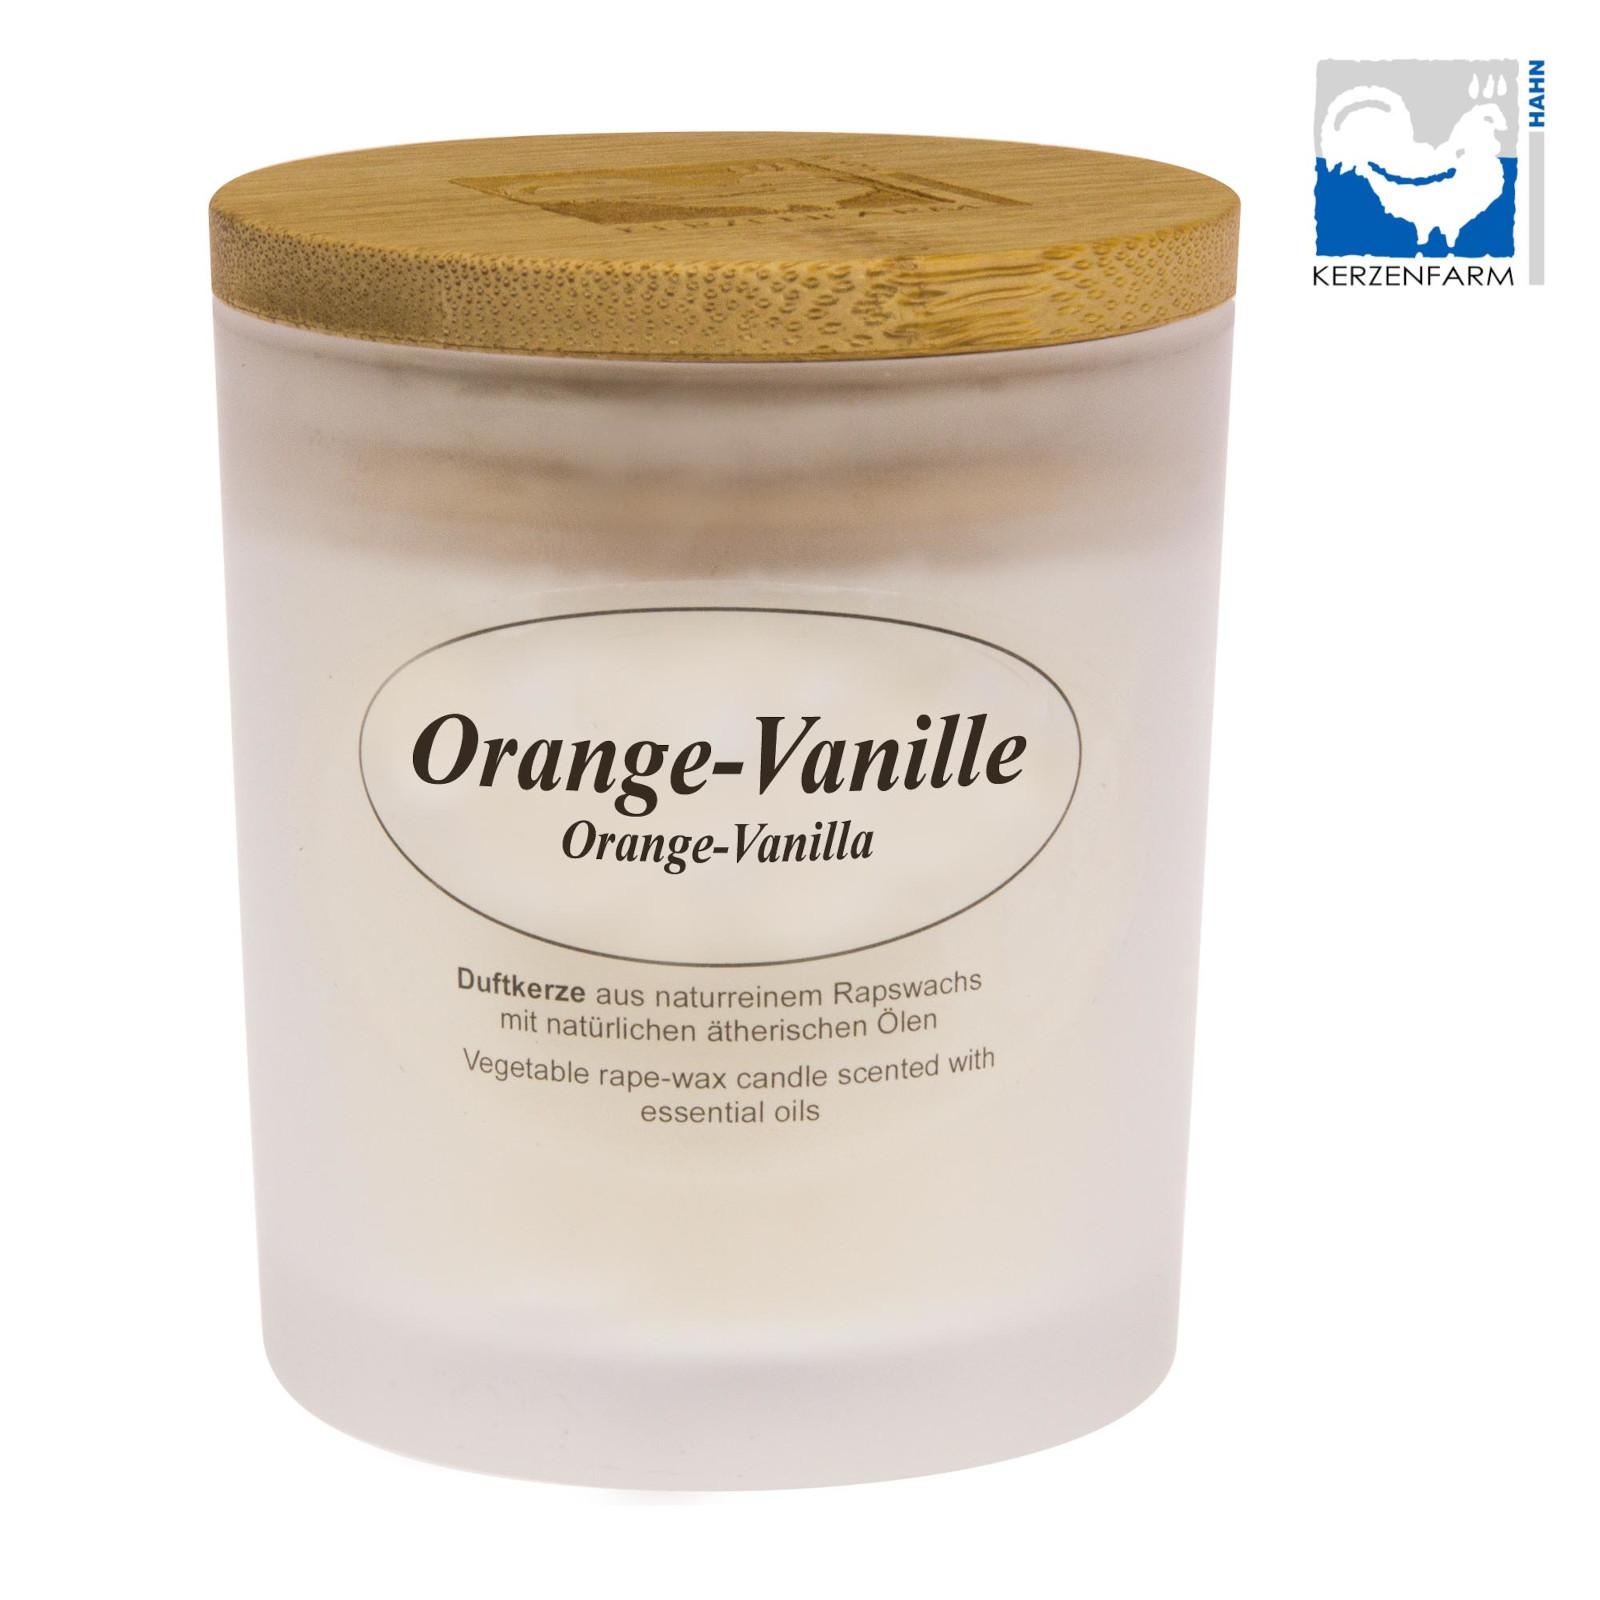 Kerzenfarm Přírodní svíčka Orange Vanilla, mléčné sklo 1 ks, 8 cm